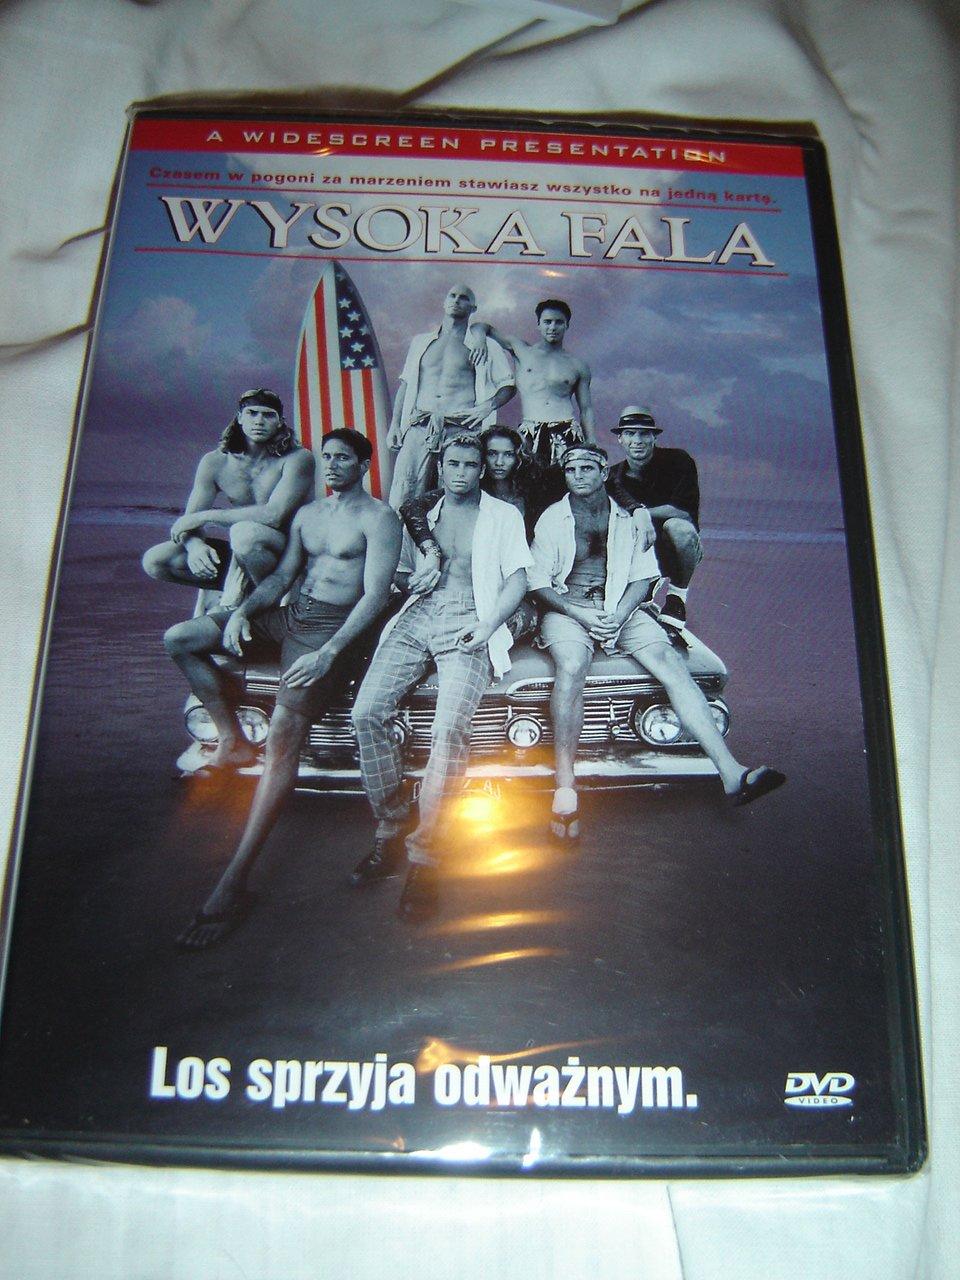 Amazon.com: Wysoka fala - In Gods Hands / Los sprzyja odwaznym / Audio: English, German / Subtitles: Polish, ...: Matt George, Matty Liu, Shane Dorian, ...